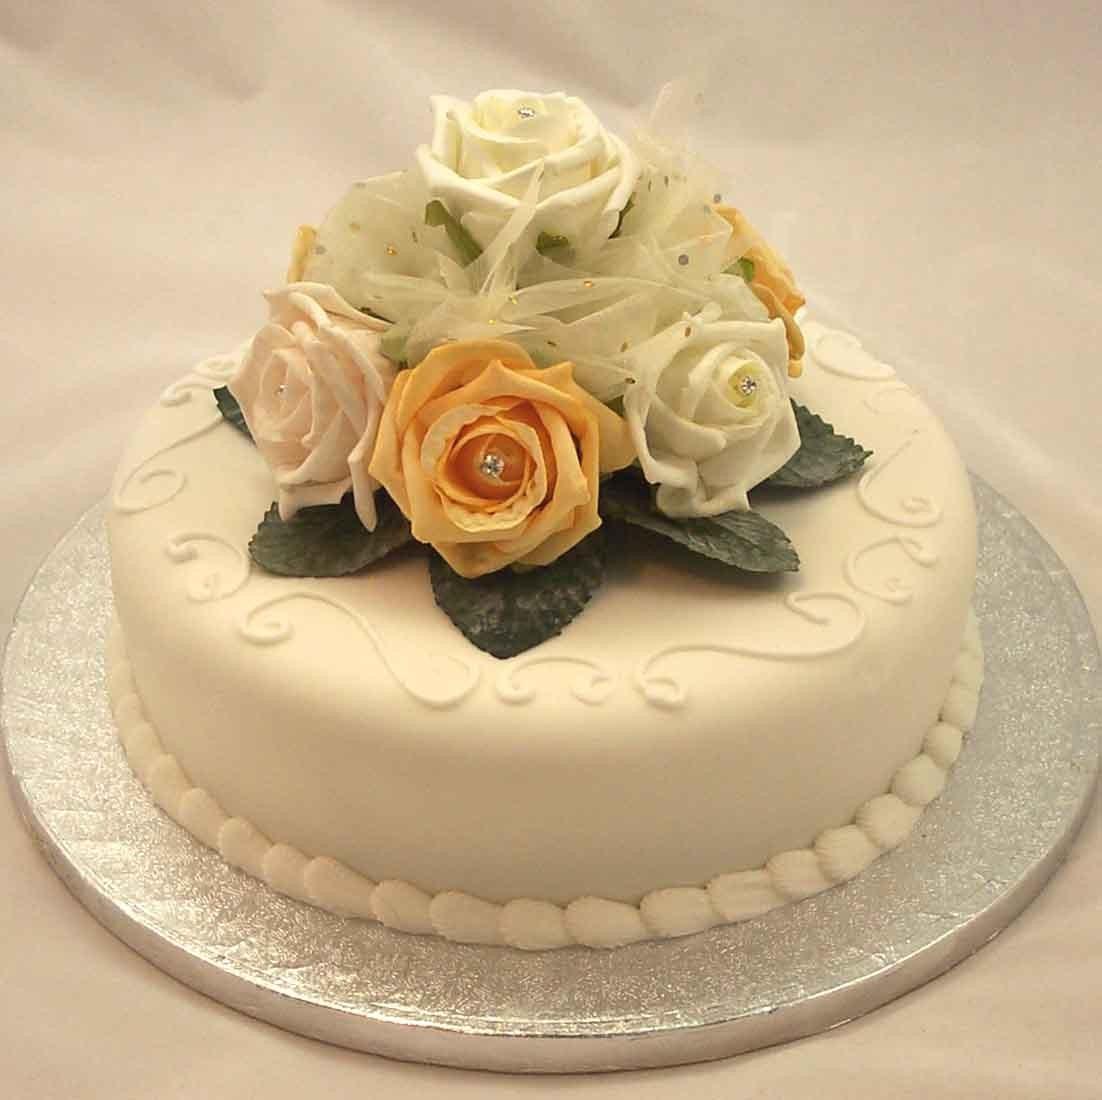 Cake Decorations  Ivory  Gold Rose Diamante Organza Cake